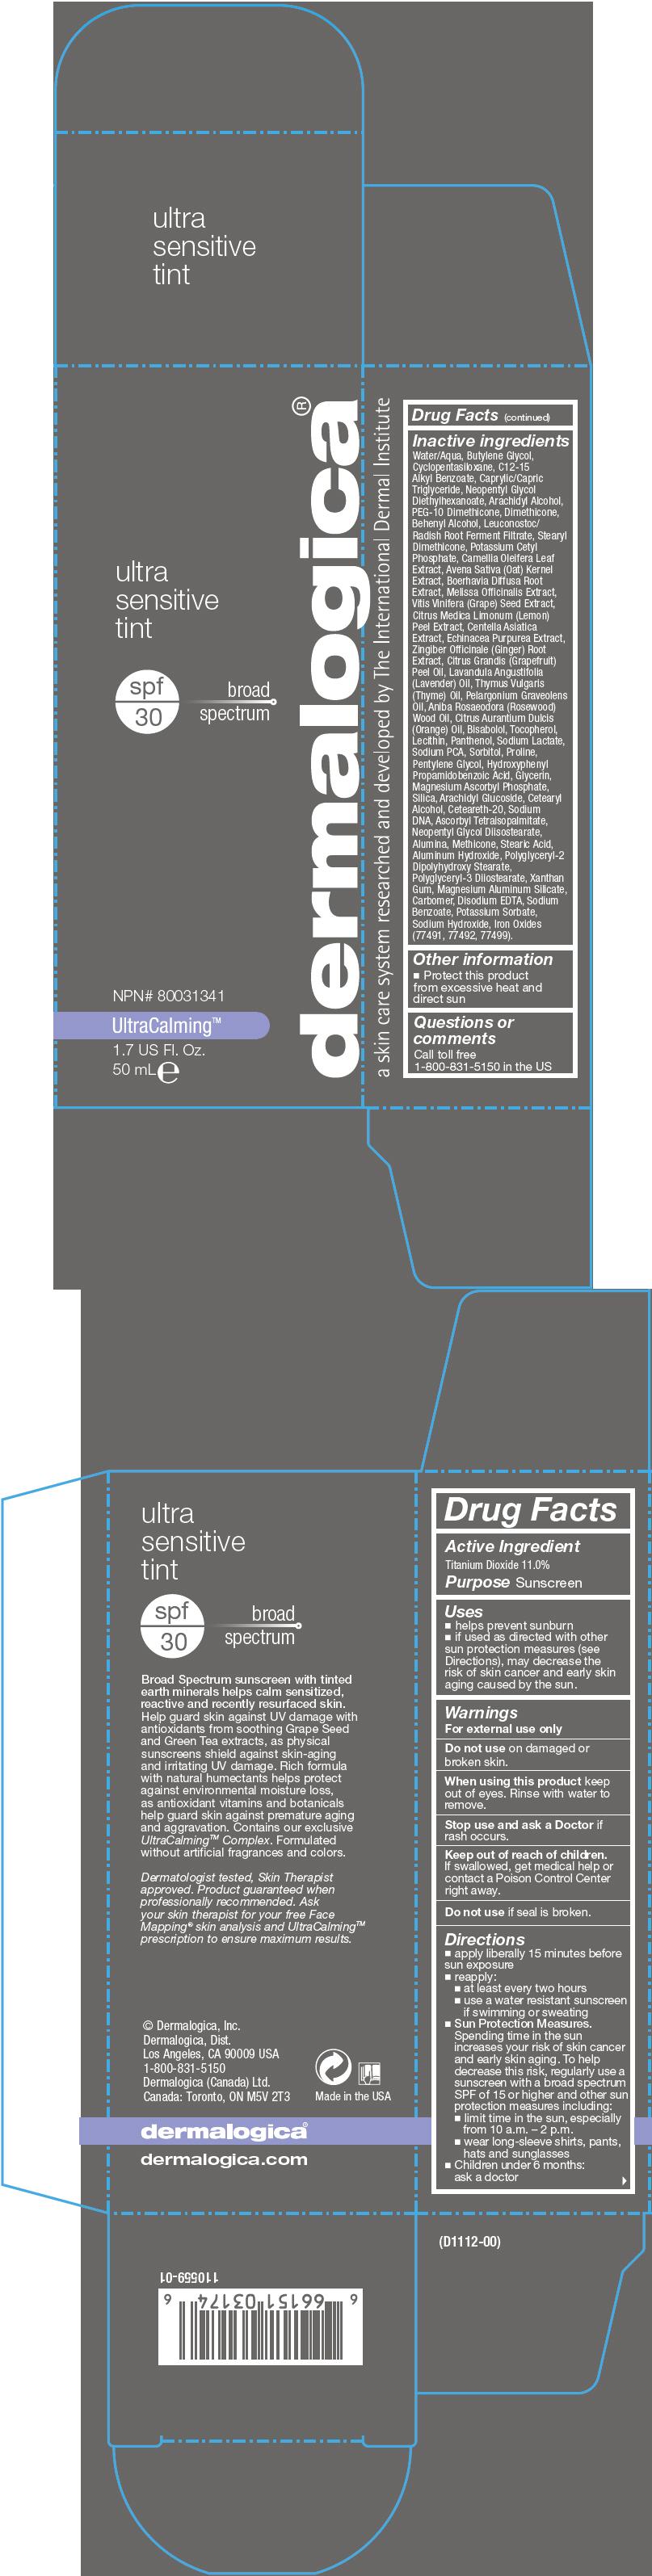 Ultrasensitive Tint Spf 30 (Titanium Dioxide) Lotion [Dermalogica, Inc.]